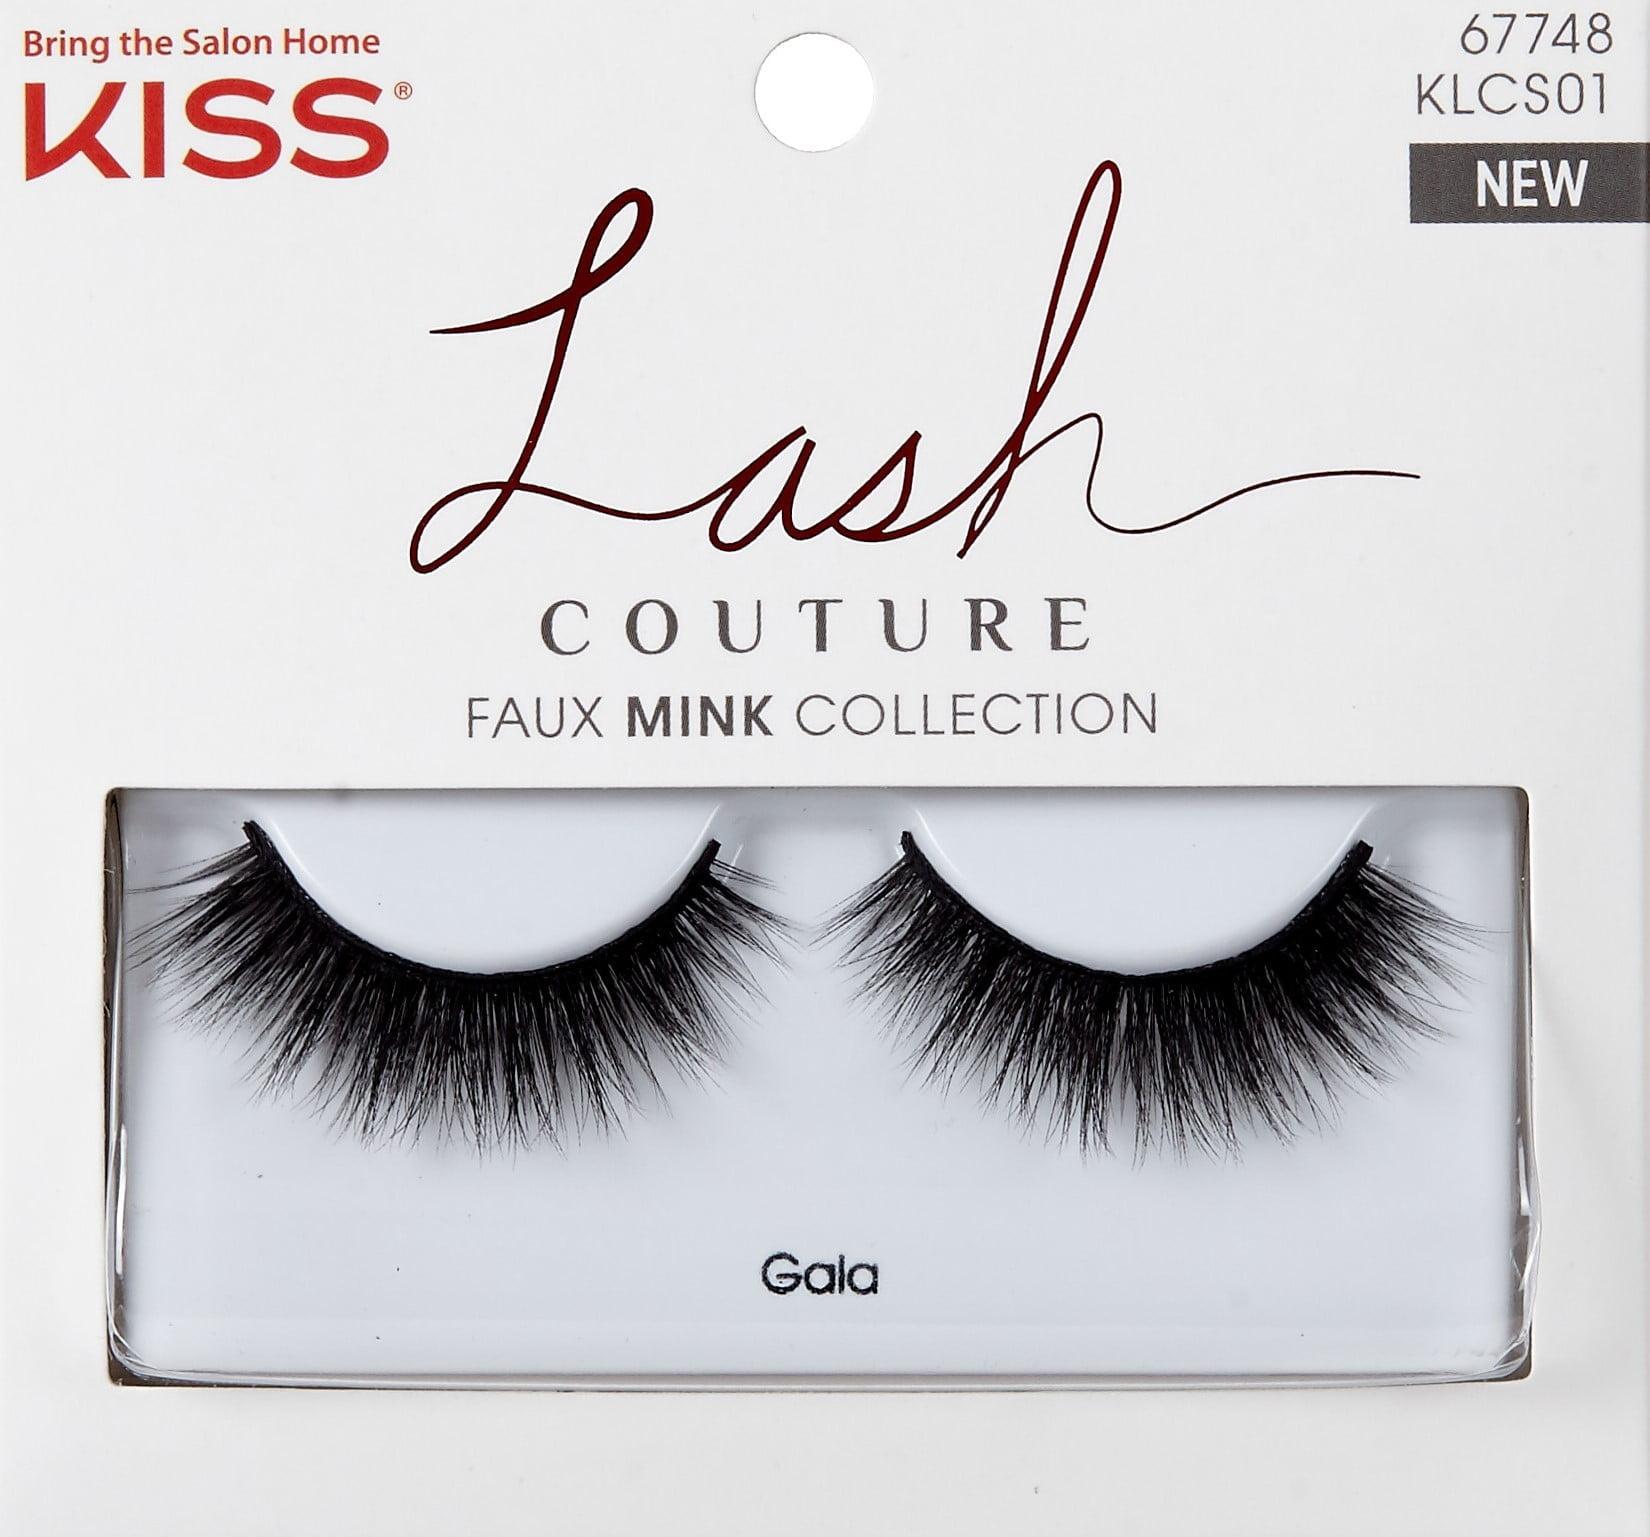 Lash Couture Faux Mink Gala new